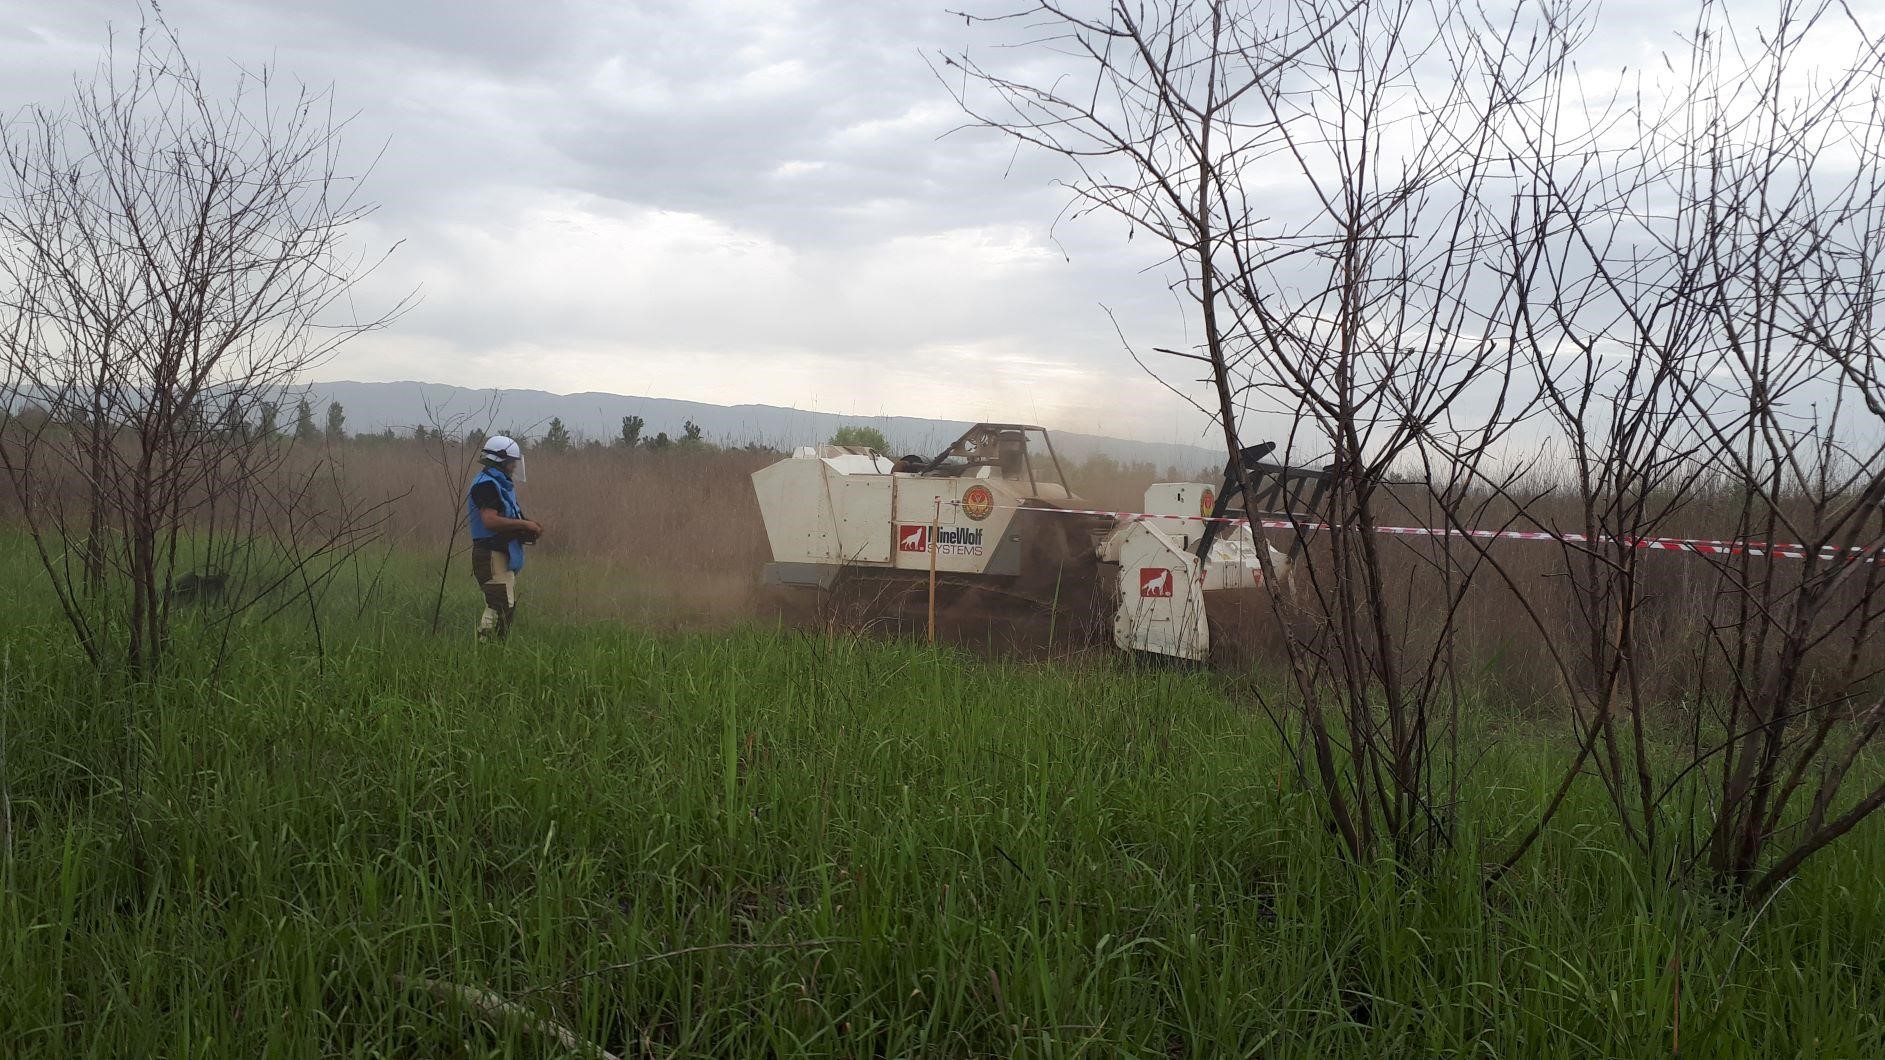 Mini-Mine Wolf machine operator, Firuz Asadbekov, conducting initial accreditation activities with the mine wolf machine in the Panj District, Khatlon region, located along the Tajik-Afghan border. (Photo courtesy of Norwegian People's Aid (NPA)